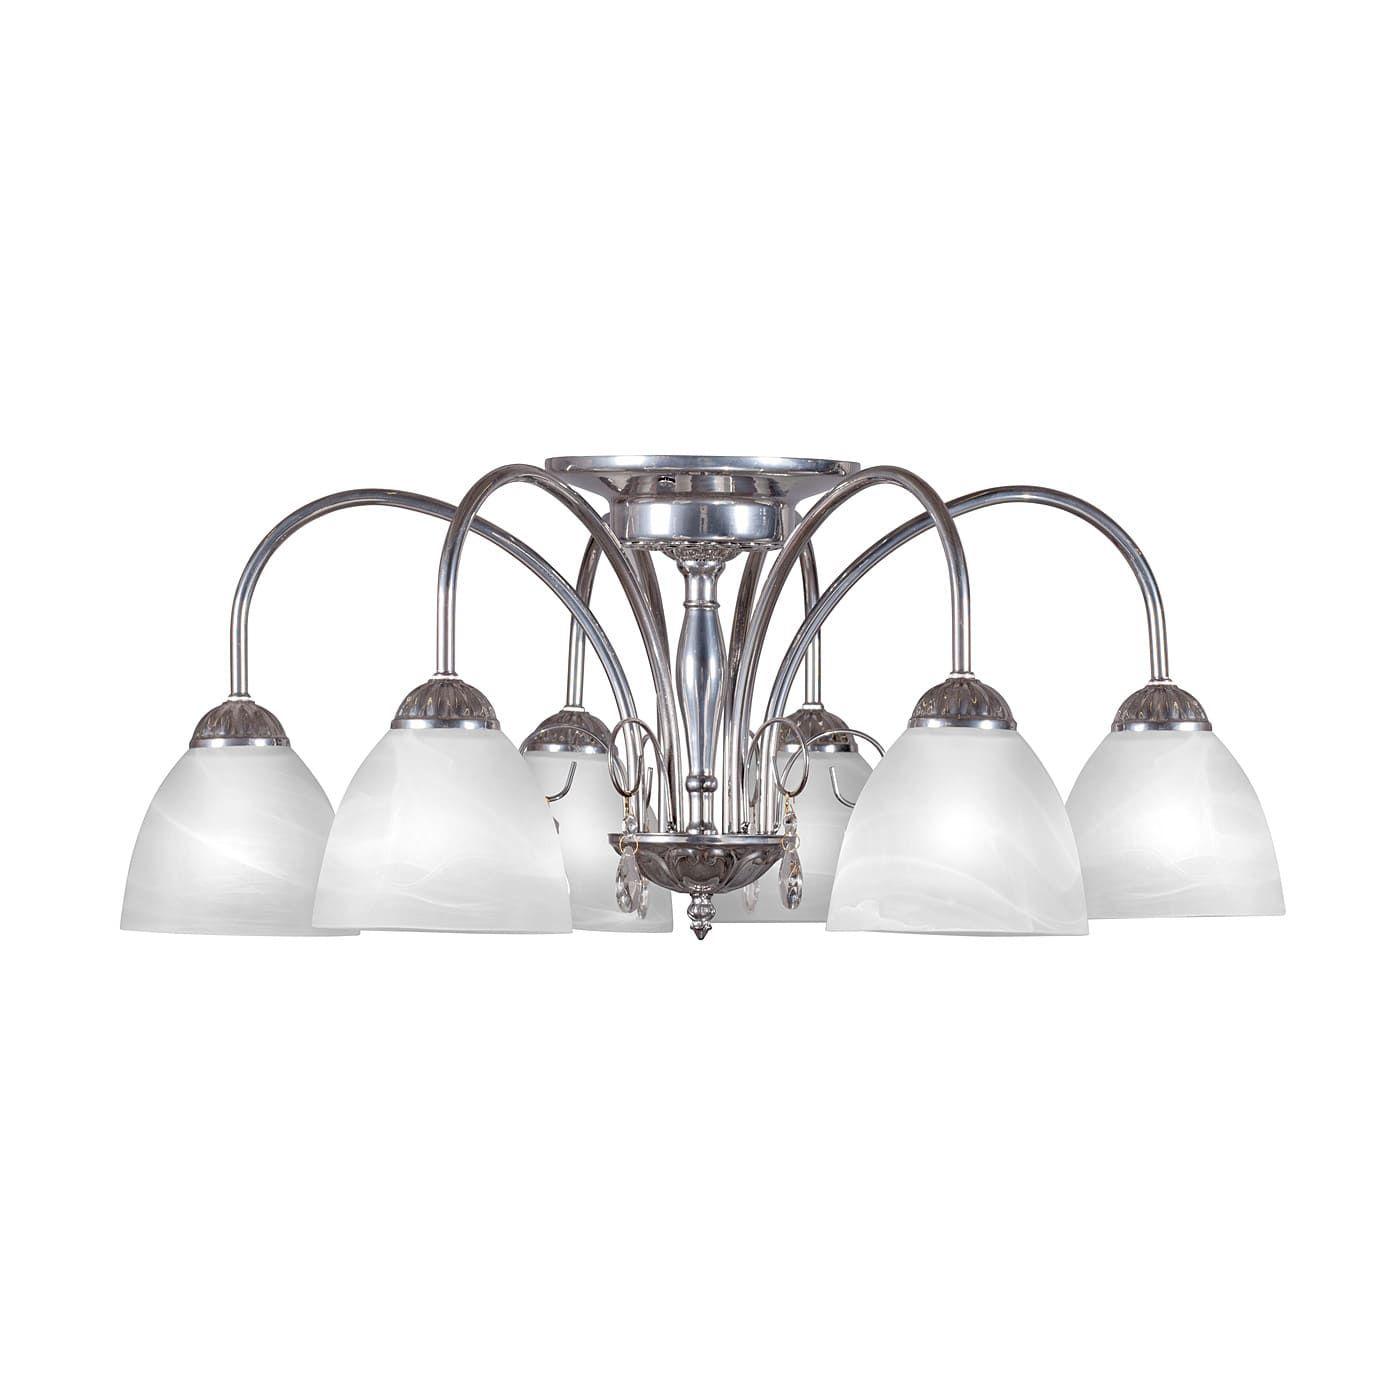 PETRASVET / Ceiling chandelier S2126-6, 6xE27 max. 60W